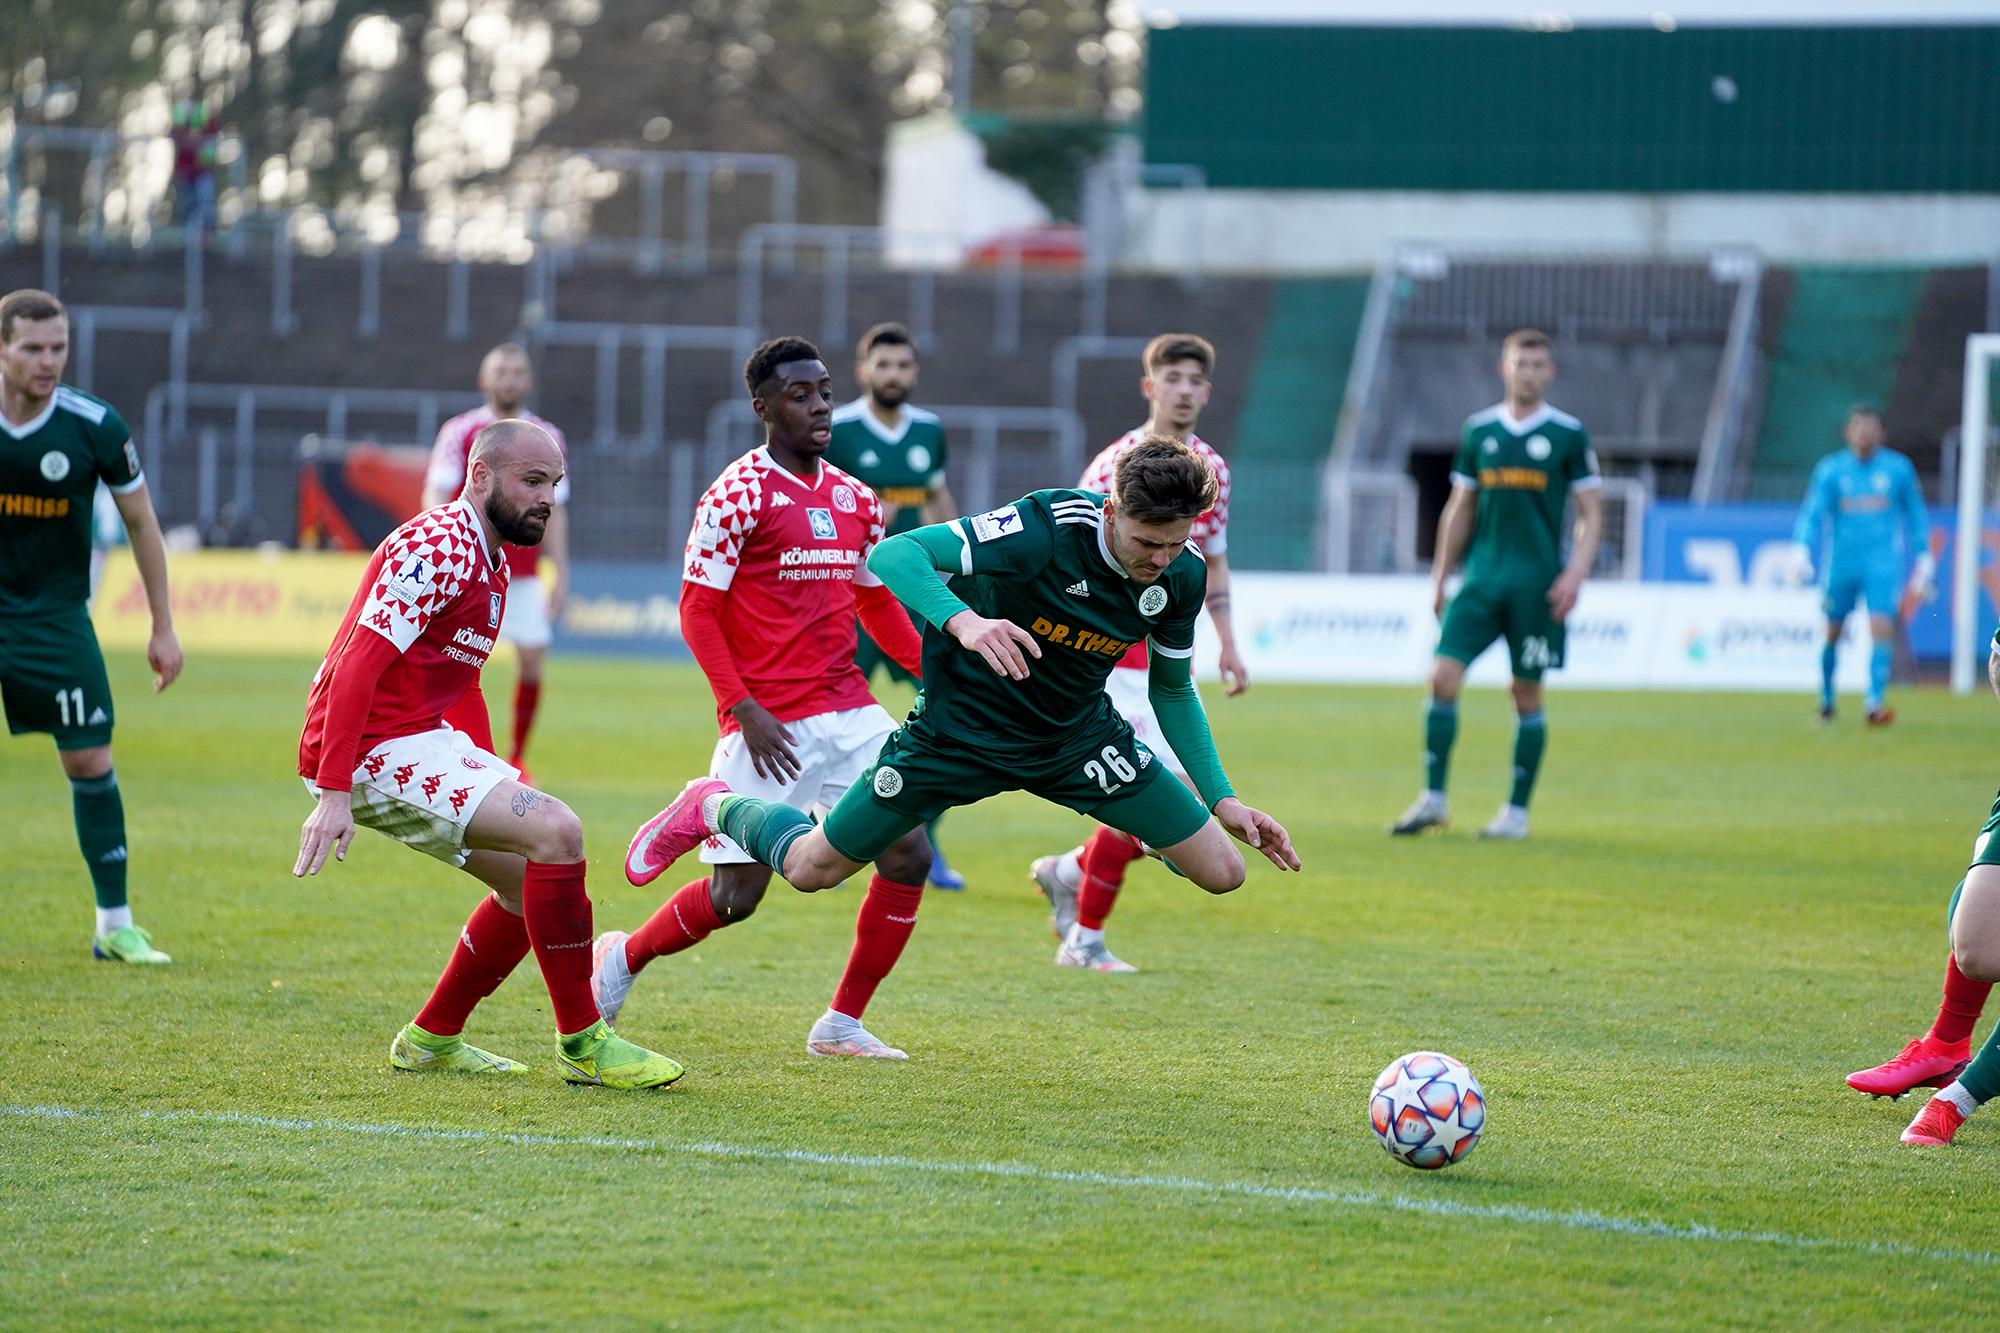 20.04.2021   Saison 2020/21   FC 08 Homburg   1. FSV Mainz 05 II